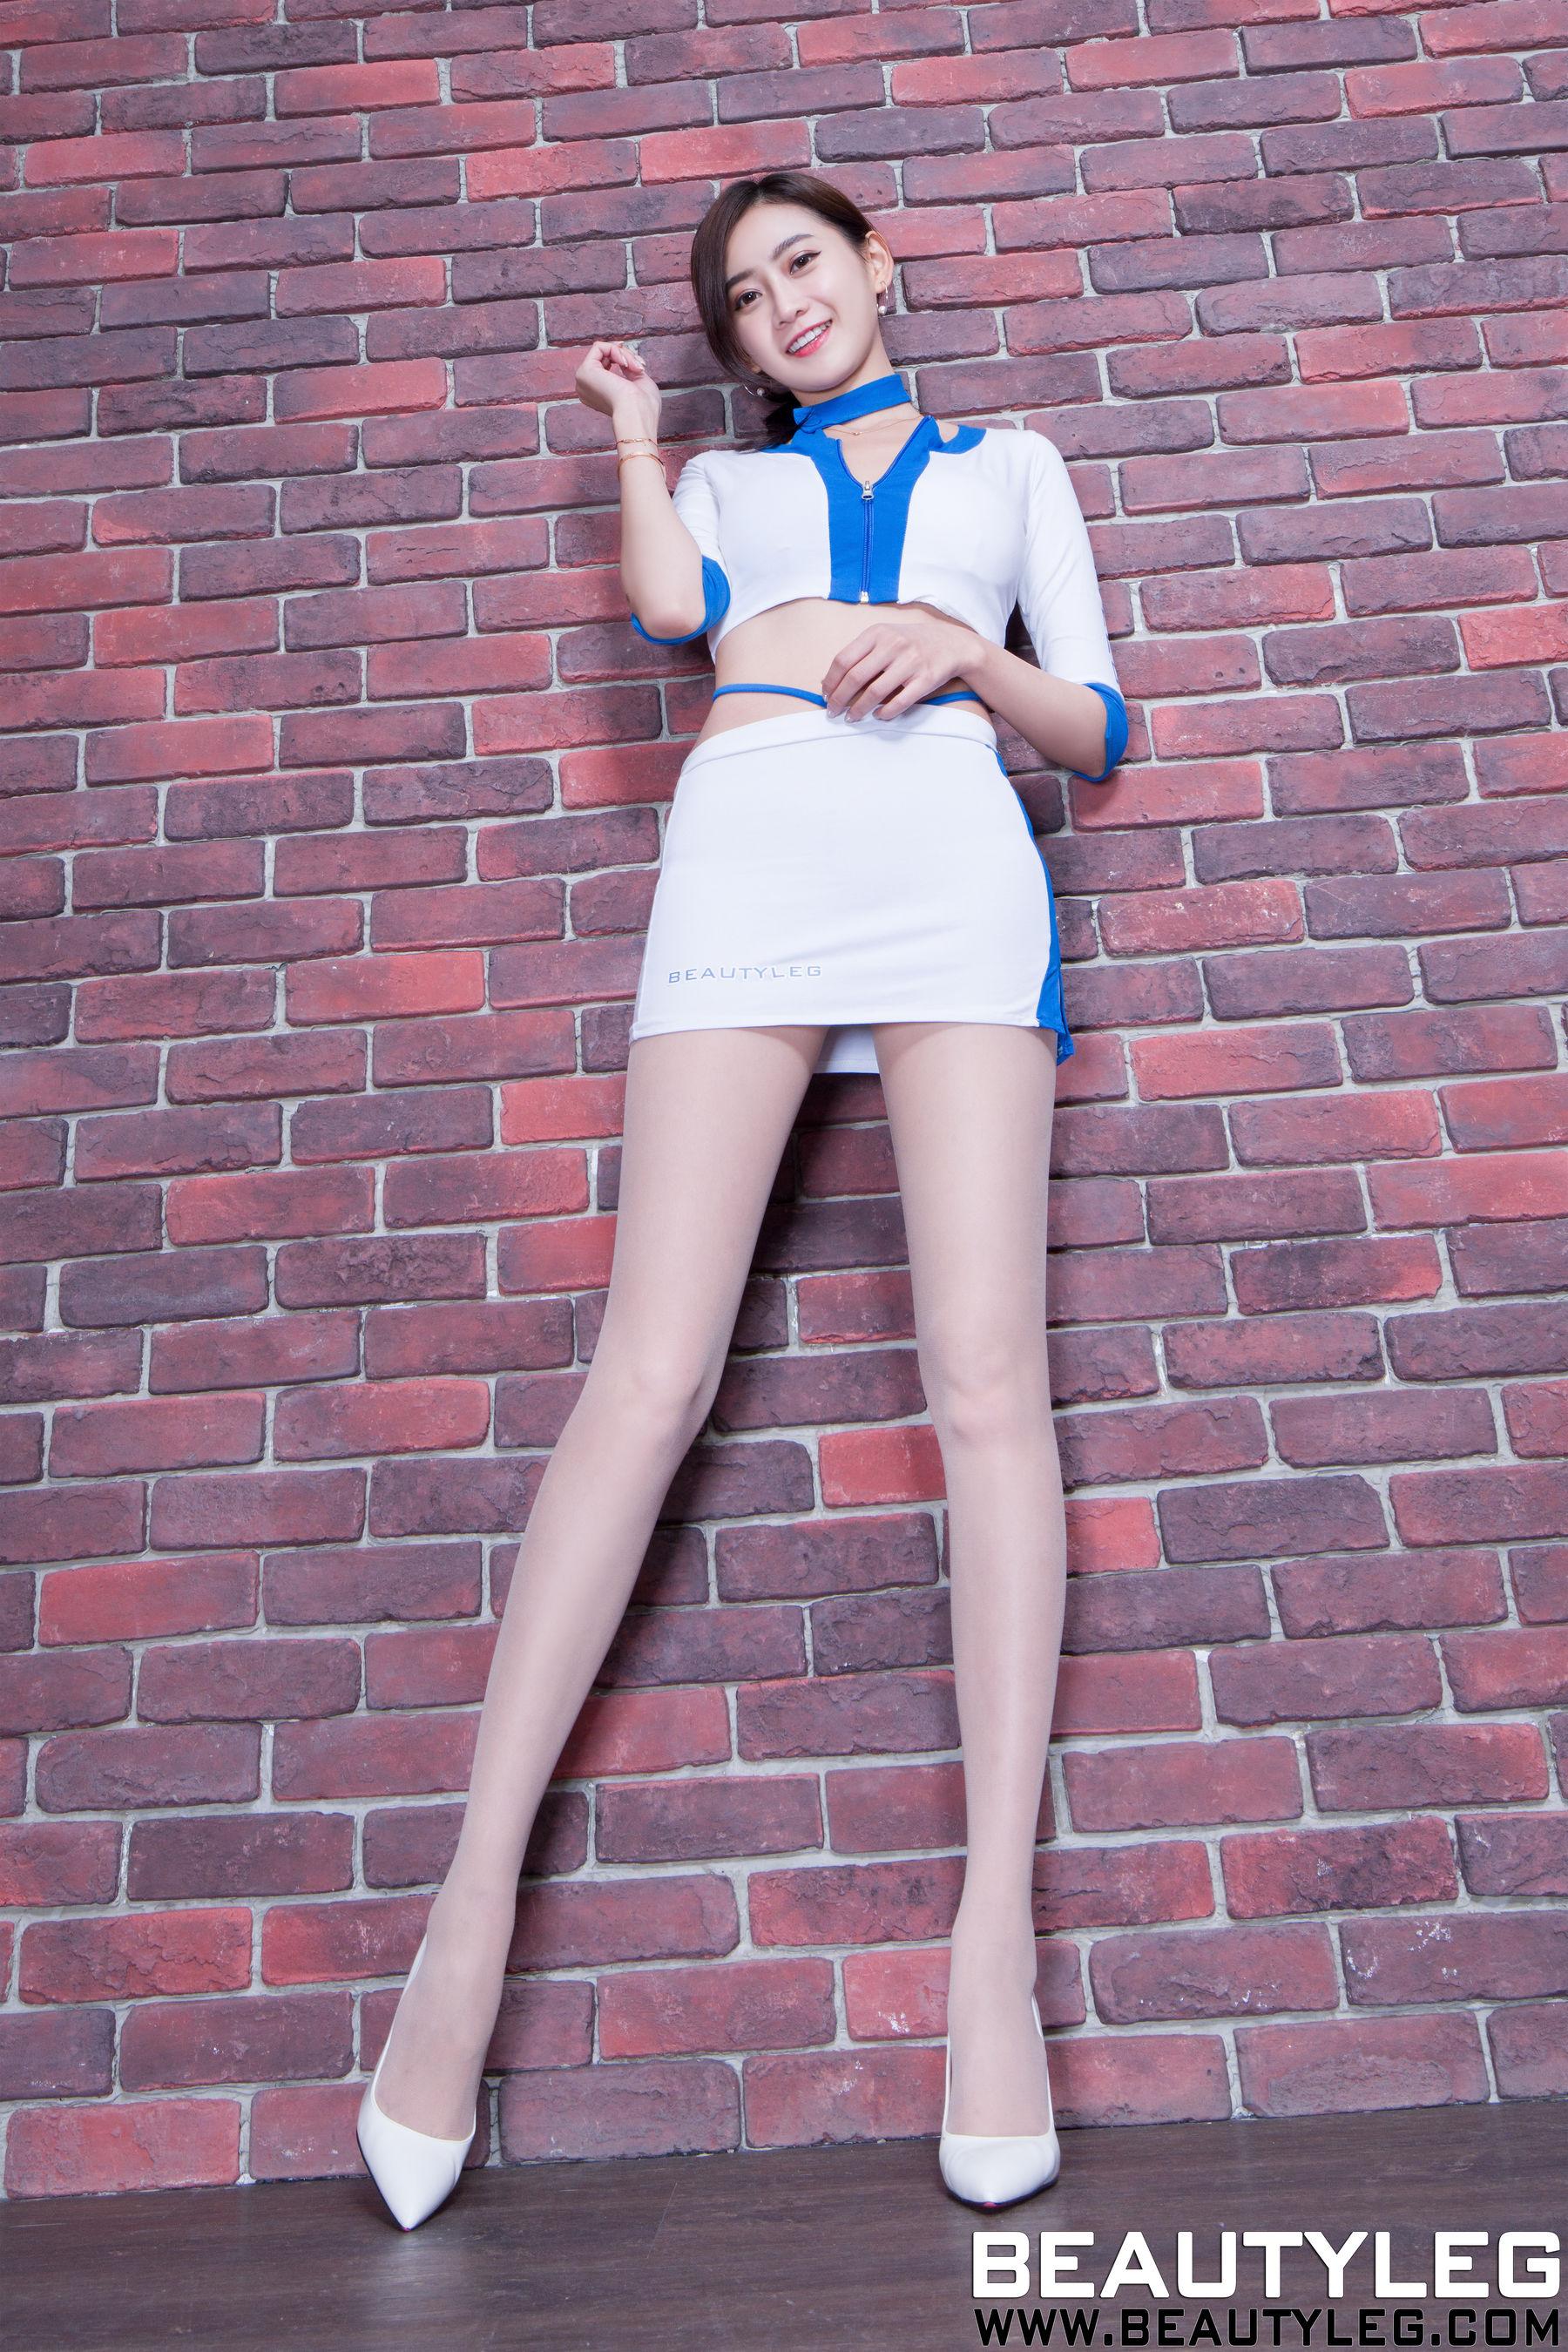 VOL.791 [Beautyleg]美腿丝袜制服:Leonie超高清个人性感漂亮大图(59P)